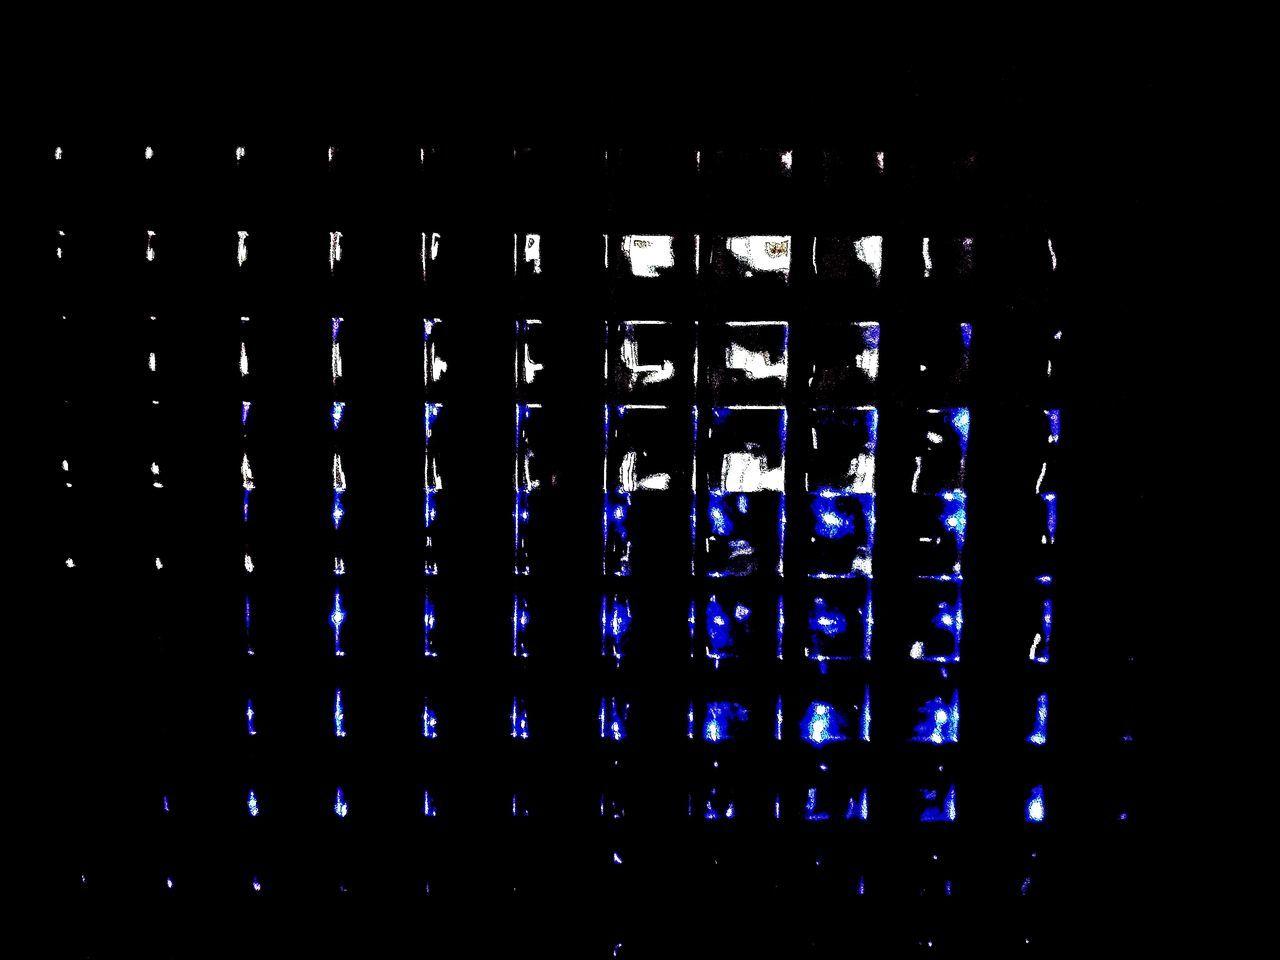 VIEW OF ILLUMINATED LIGHTS AT NIGHT